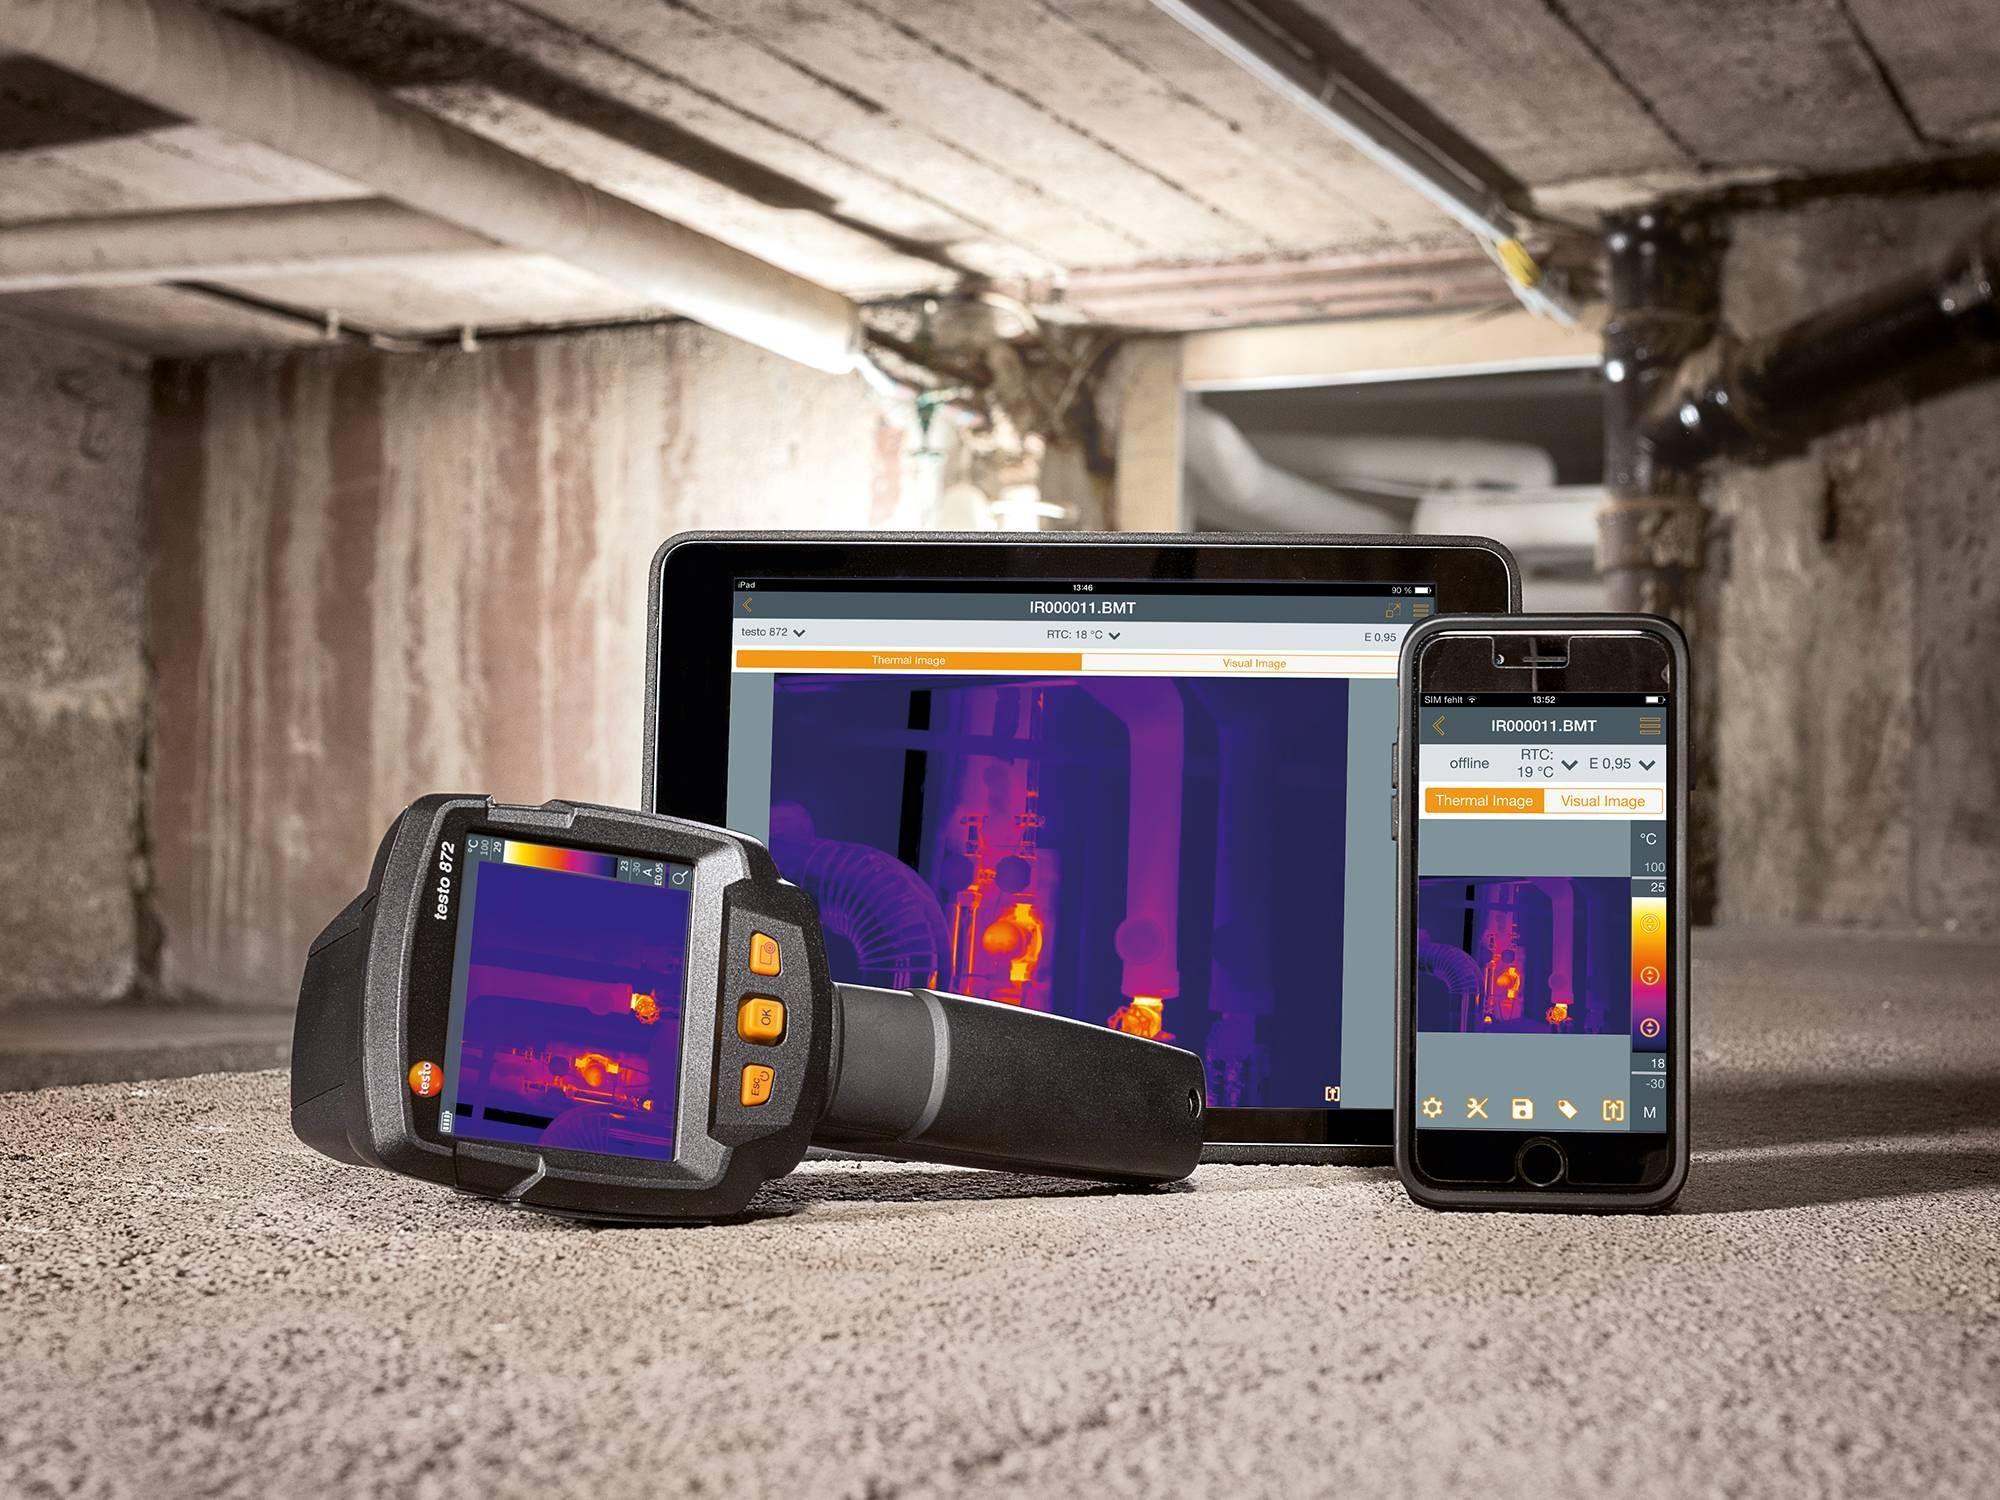 testo 868 Thermal Imaging Camera with App Part No. 0560 86